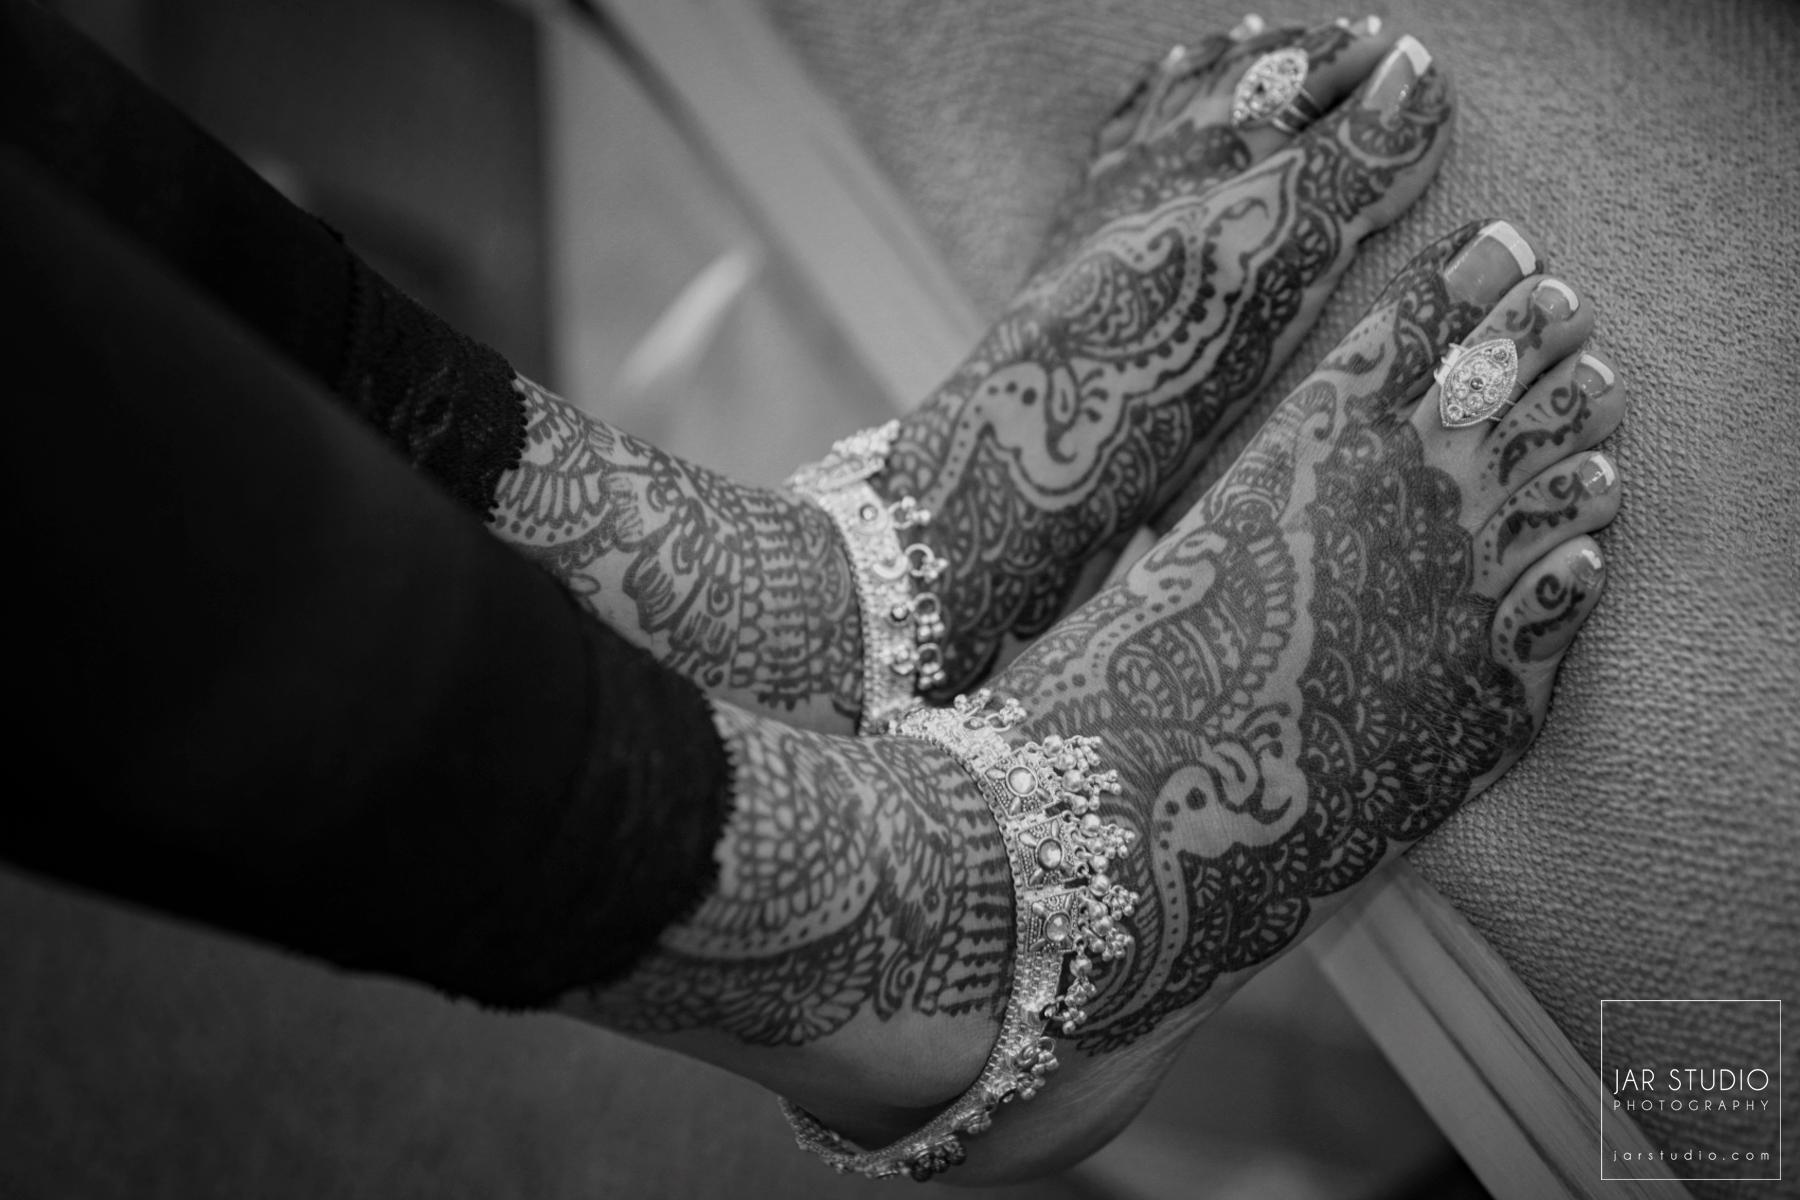 09-hindu-bride-feet-mendhi-jarstudio-photography-orlando.JPG